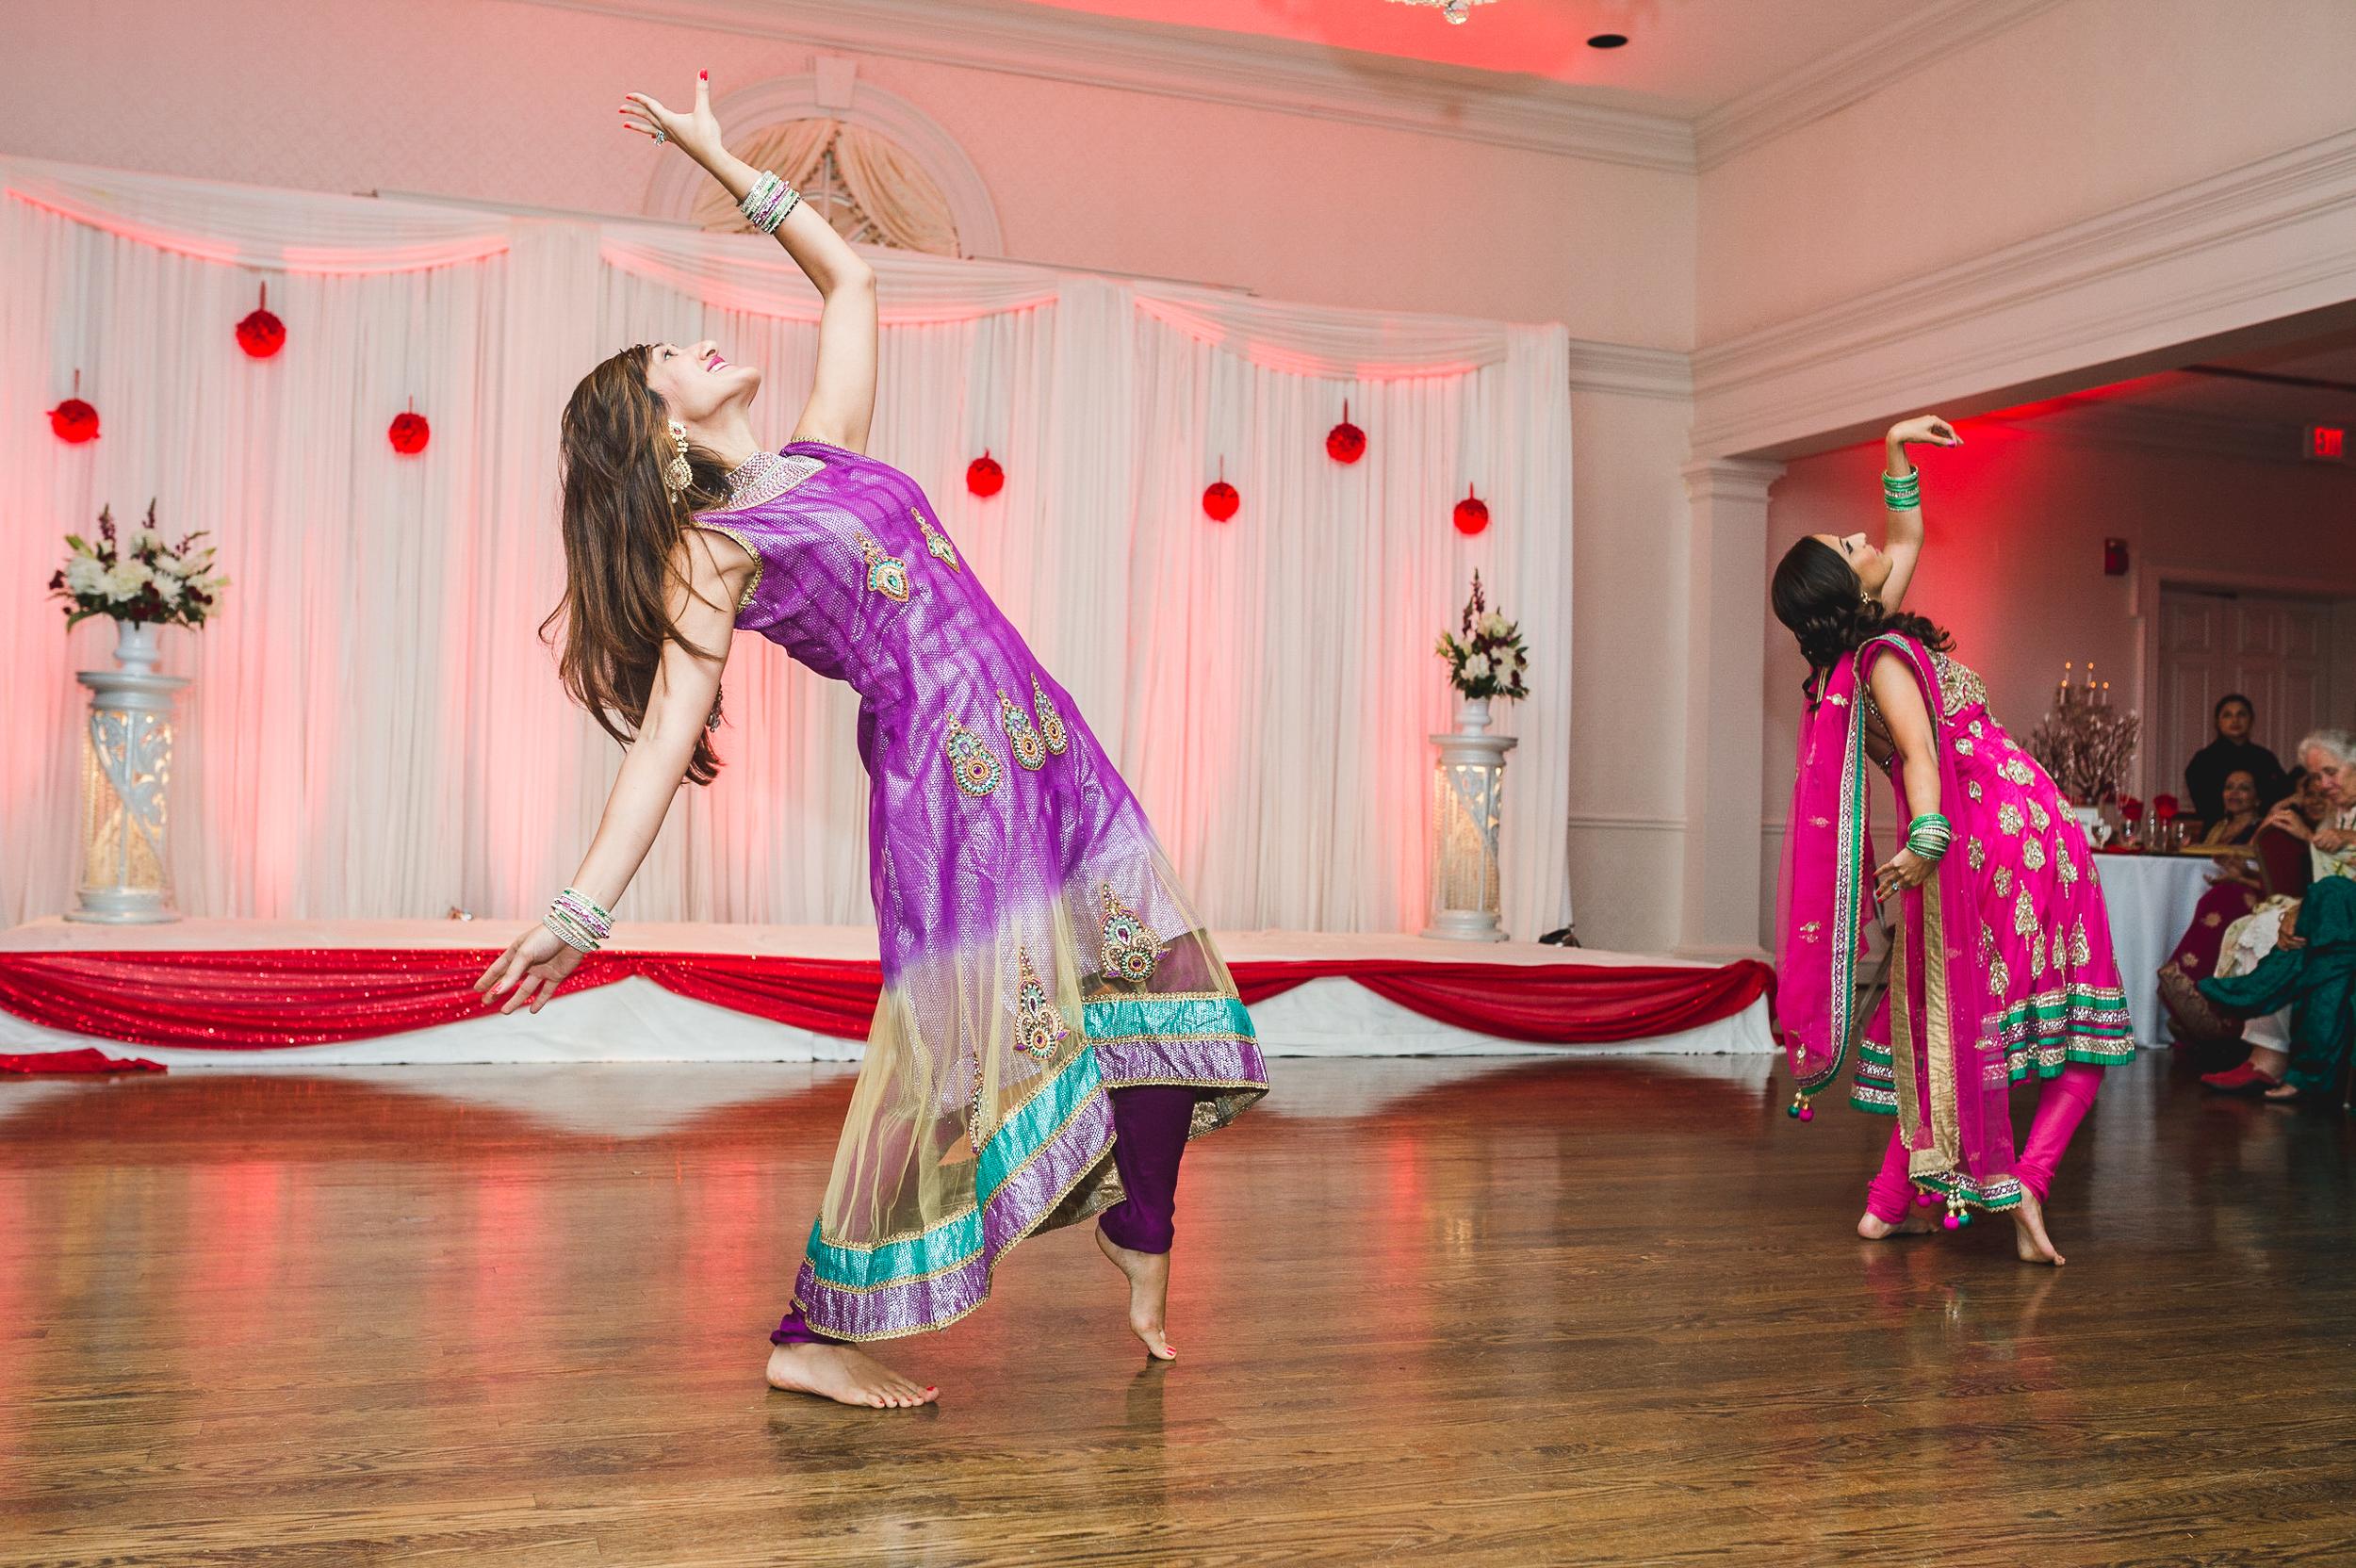 Indian wedding photographer washington dc Mantas Kubilinskas-12.jpg